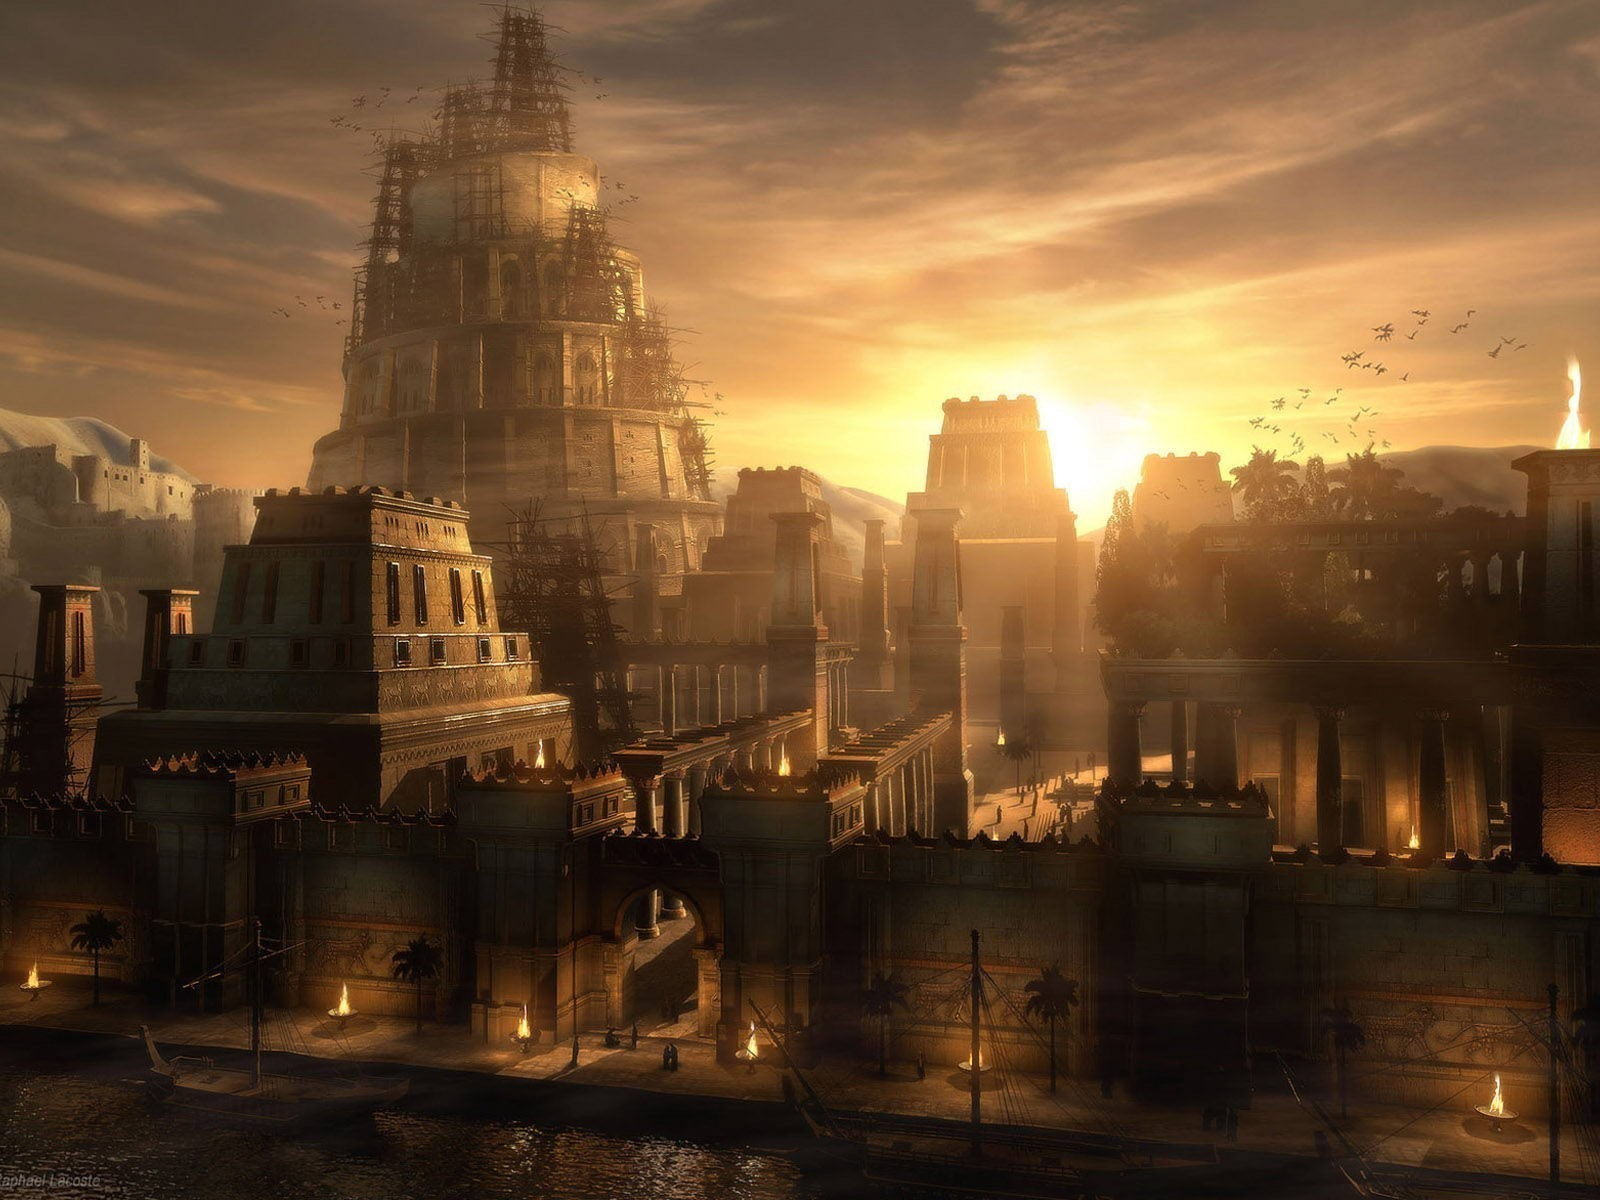 General 1600x1200 city digital art fantasy art Prince Of Persia : Warrior Within